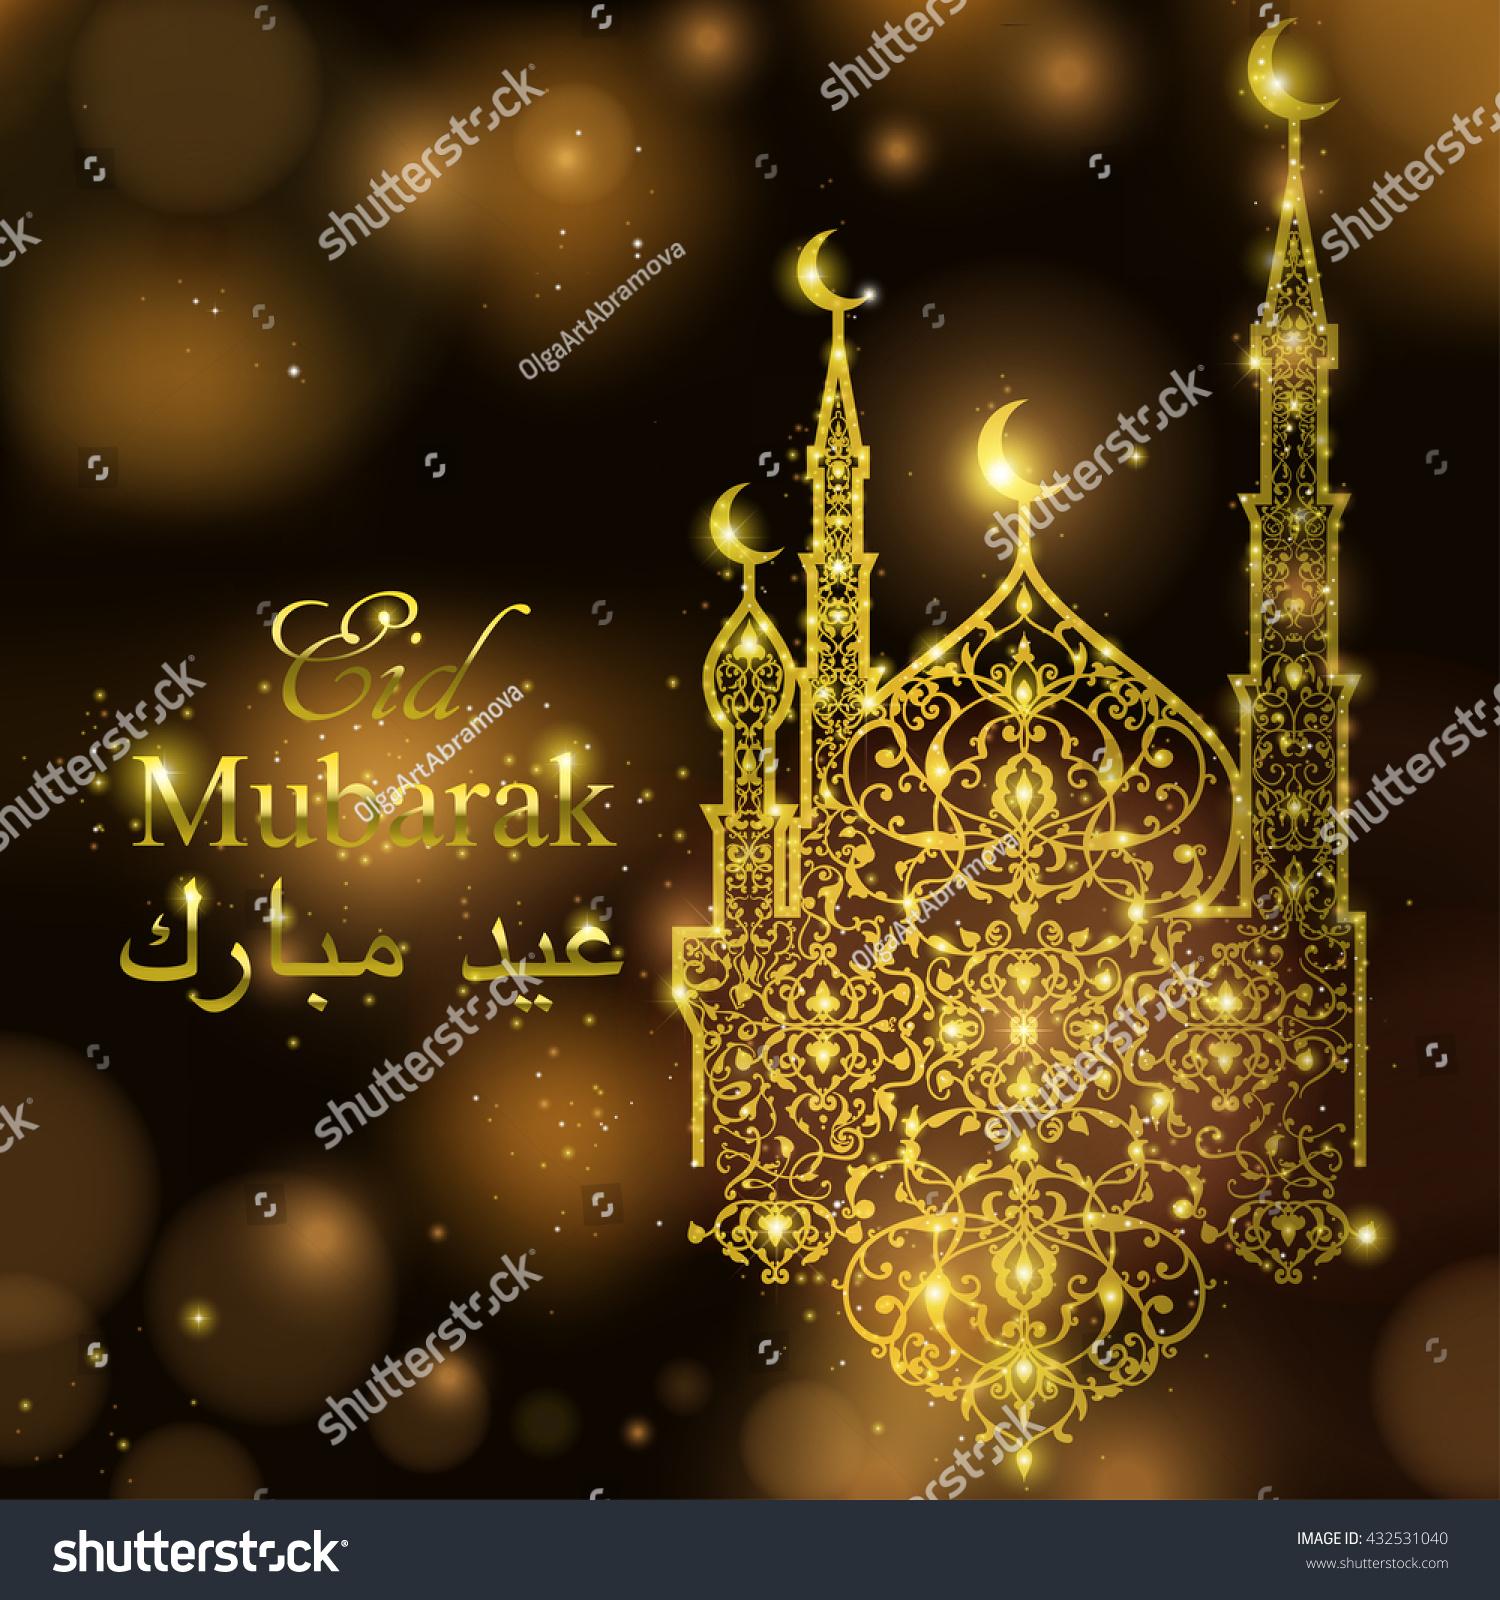 English translate eid mubarak beautiful mosque stock vector english translate eid mubarak beautiful mosque stock vector 432531040 shutterstock arubaitofo Gallery